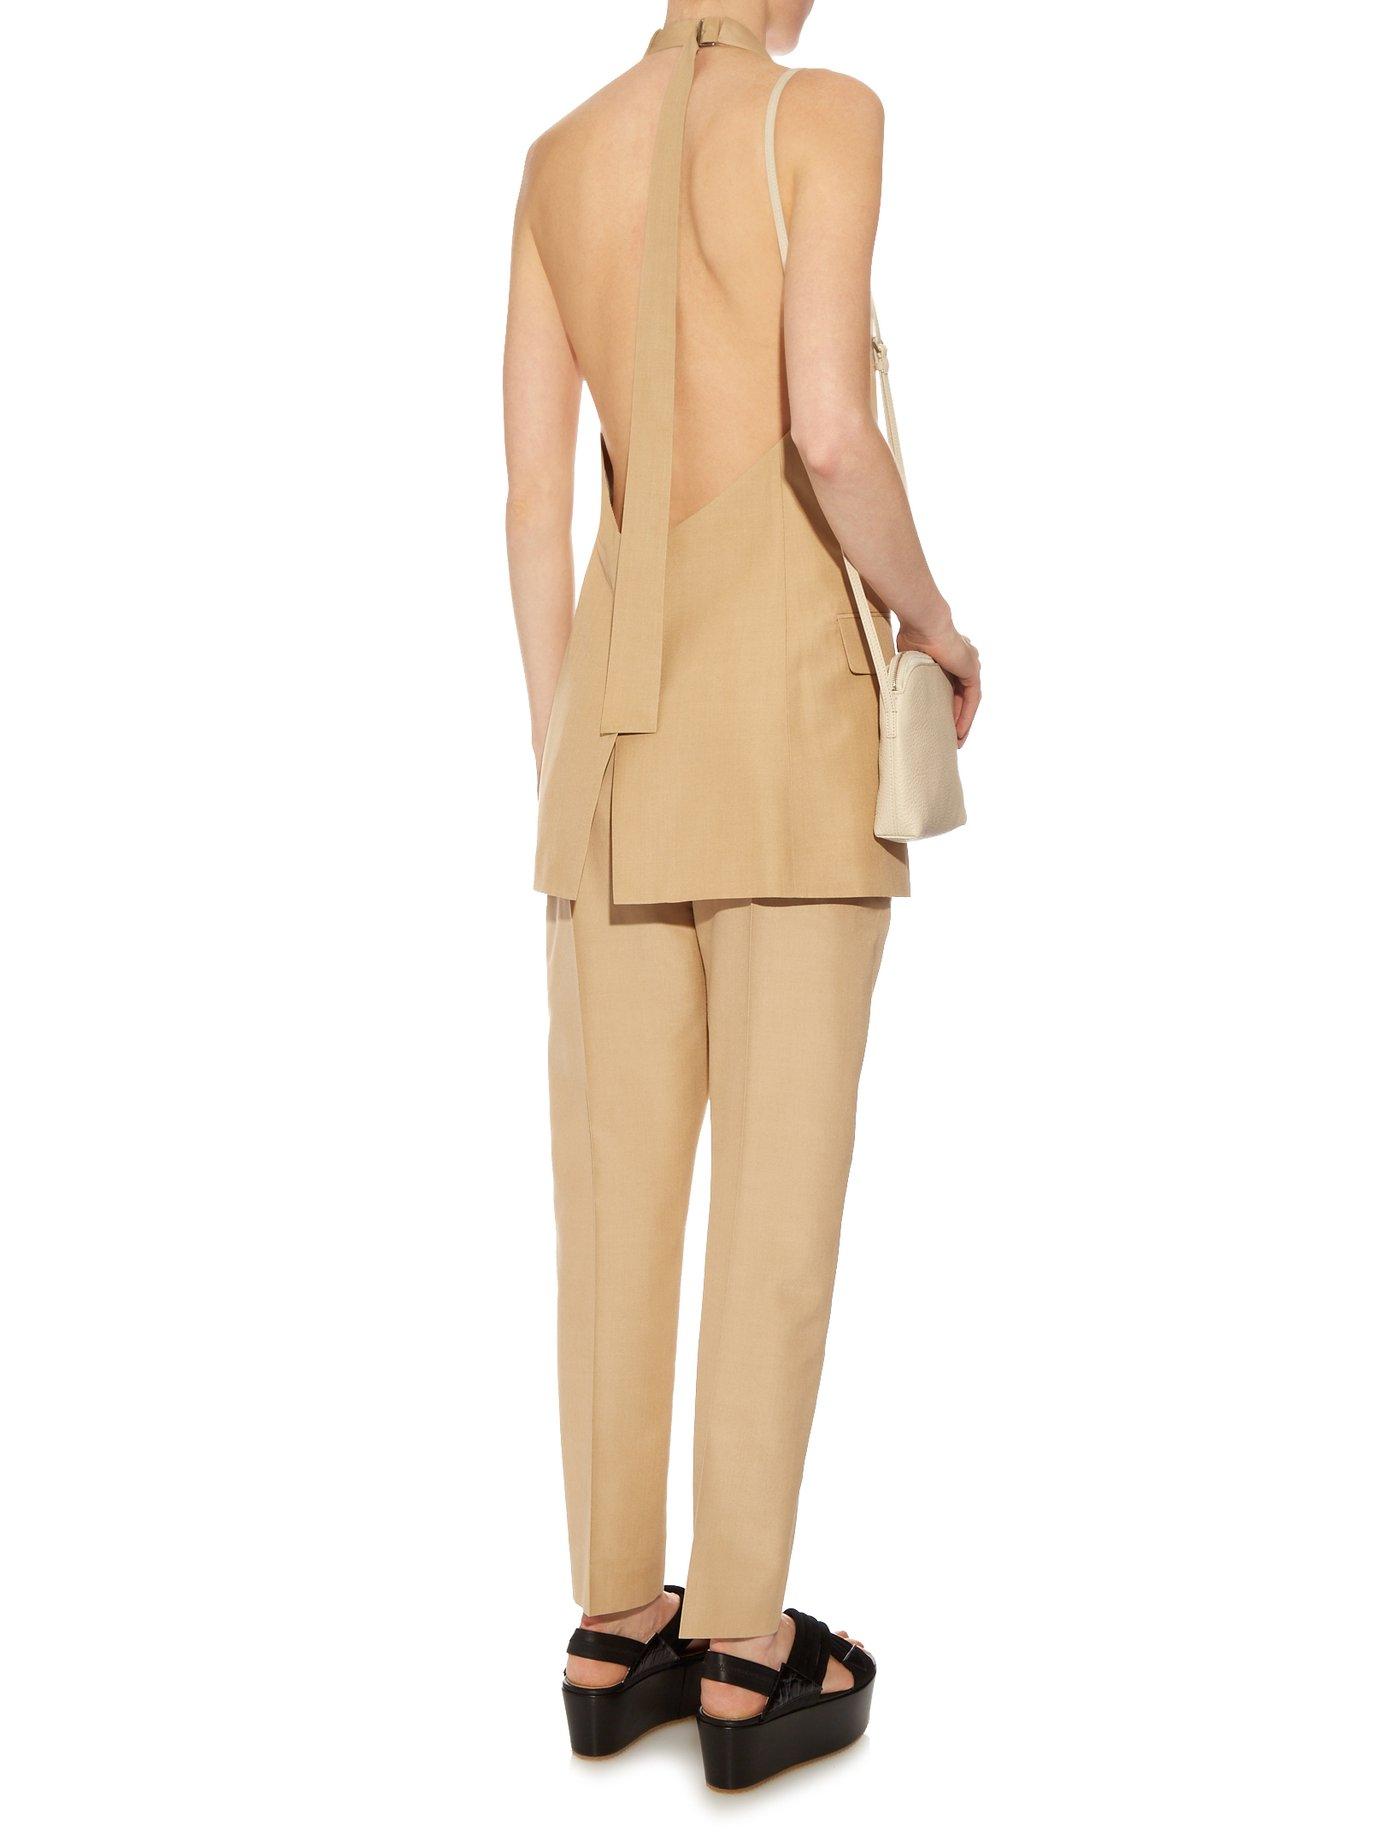 Agassi Tussa silk sleeveless jacket by Jil Sander